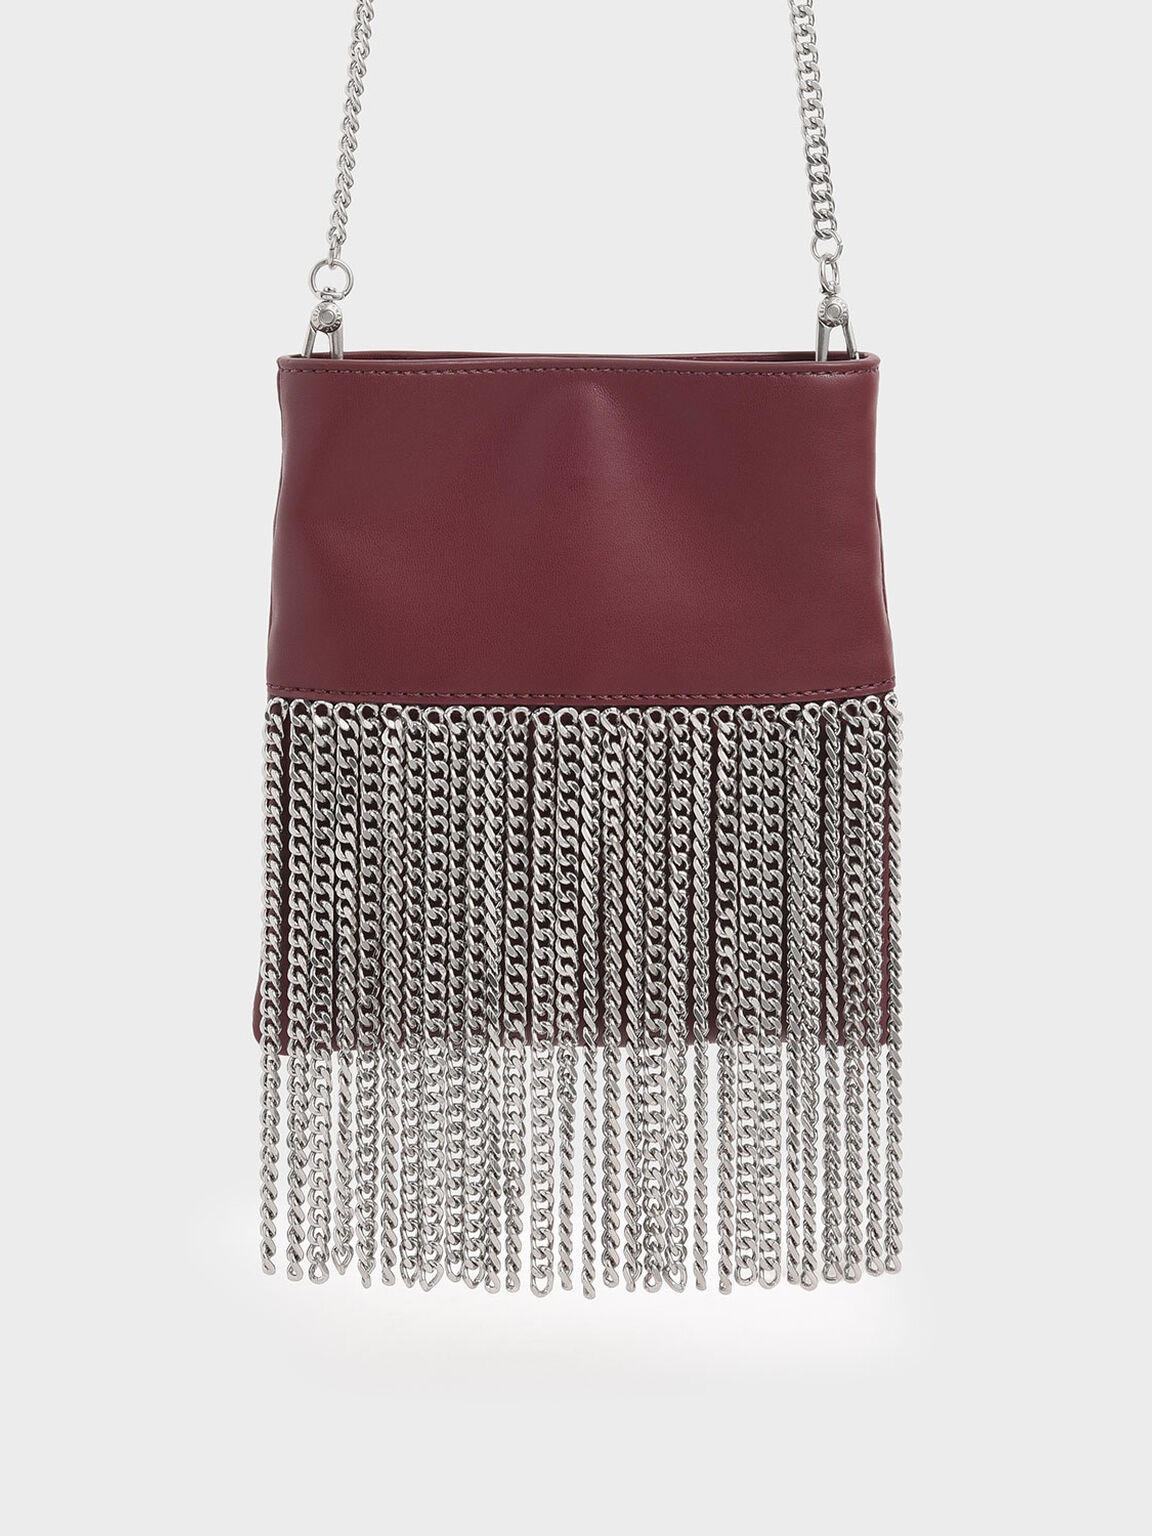 Chain Fringe Mini Crossbody Bag, Burgundy, hi-res